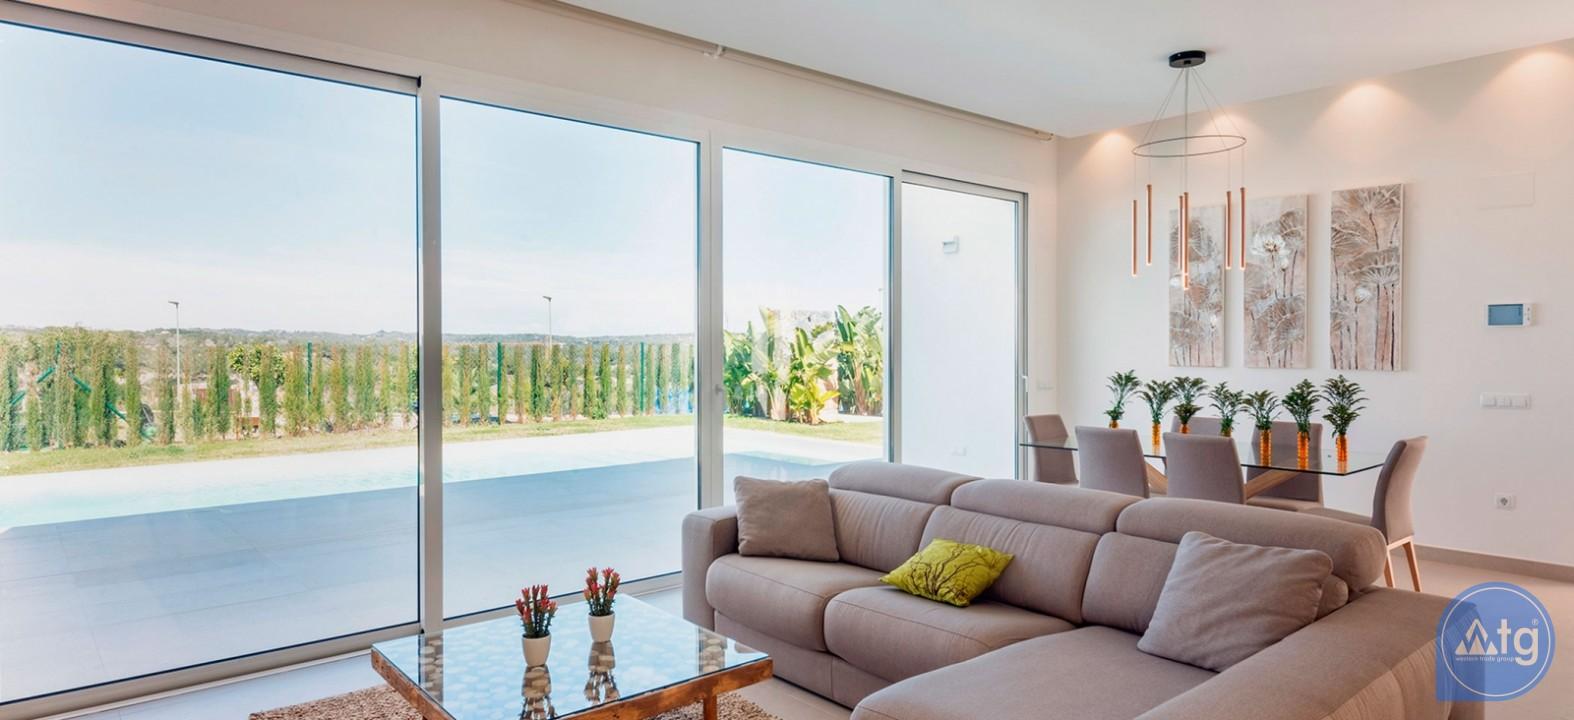 3 bedroom Bungalow in Pilar de la Horadada - SR2619 - 5